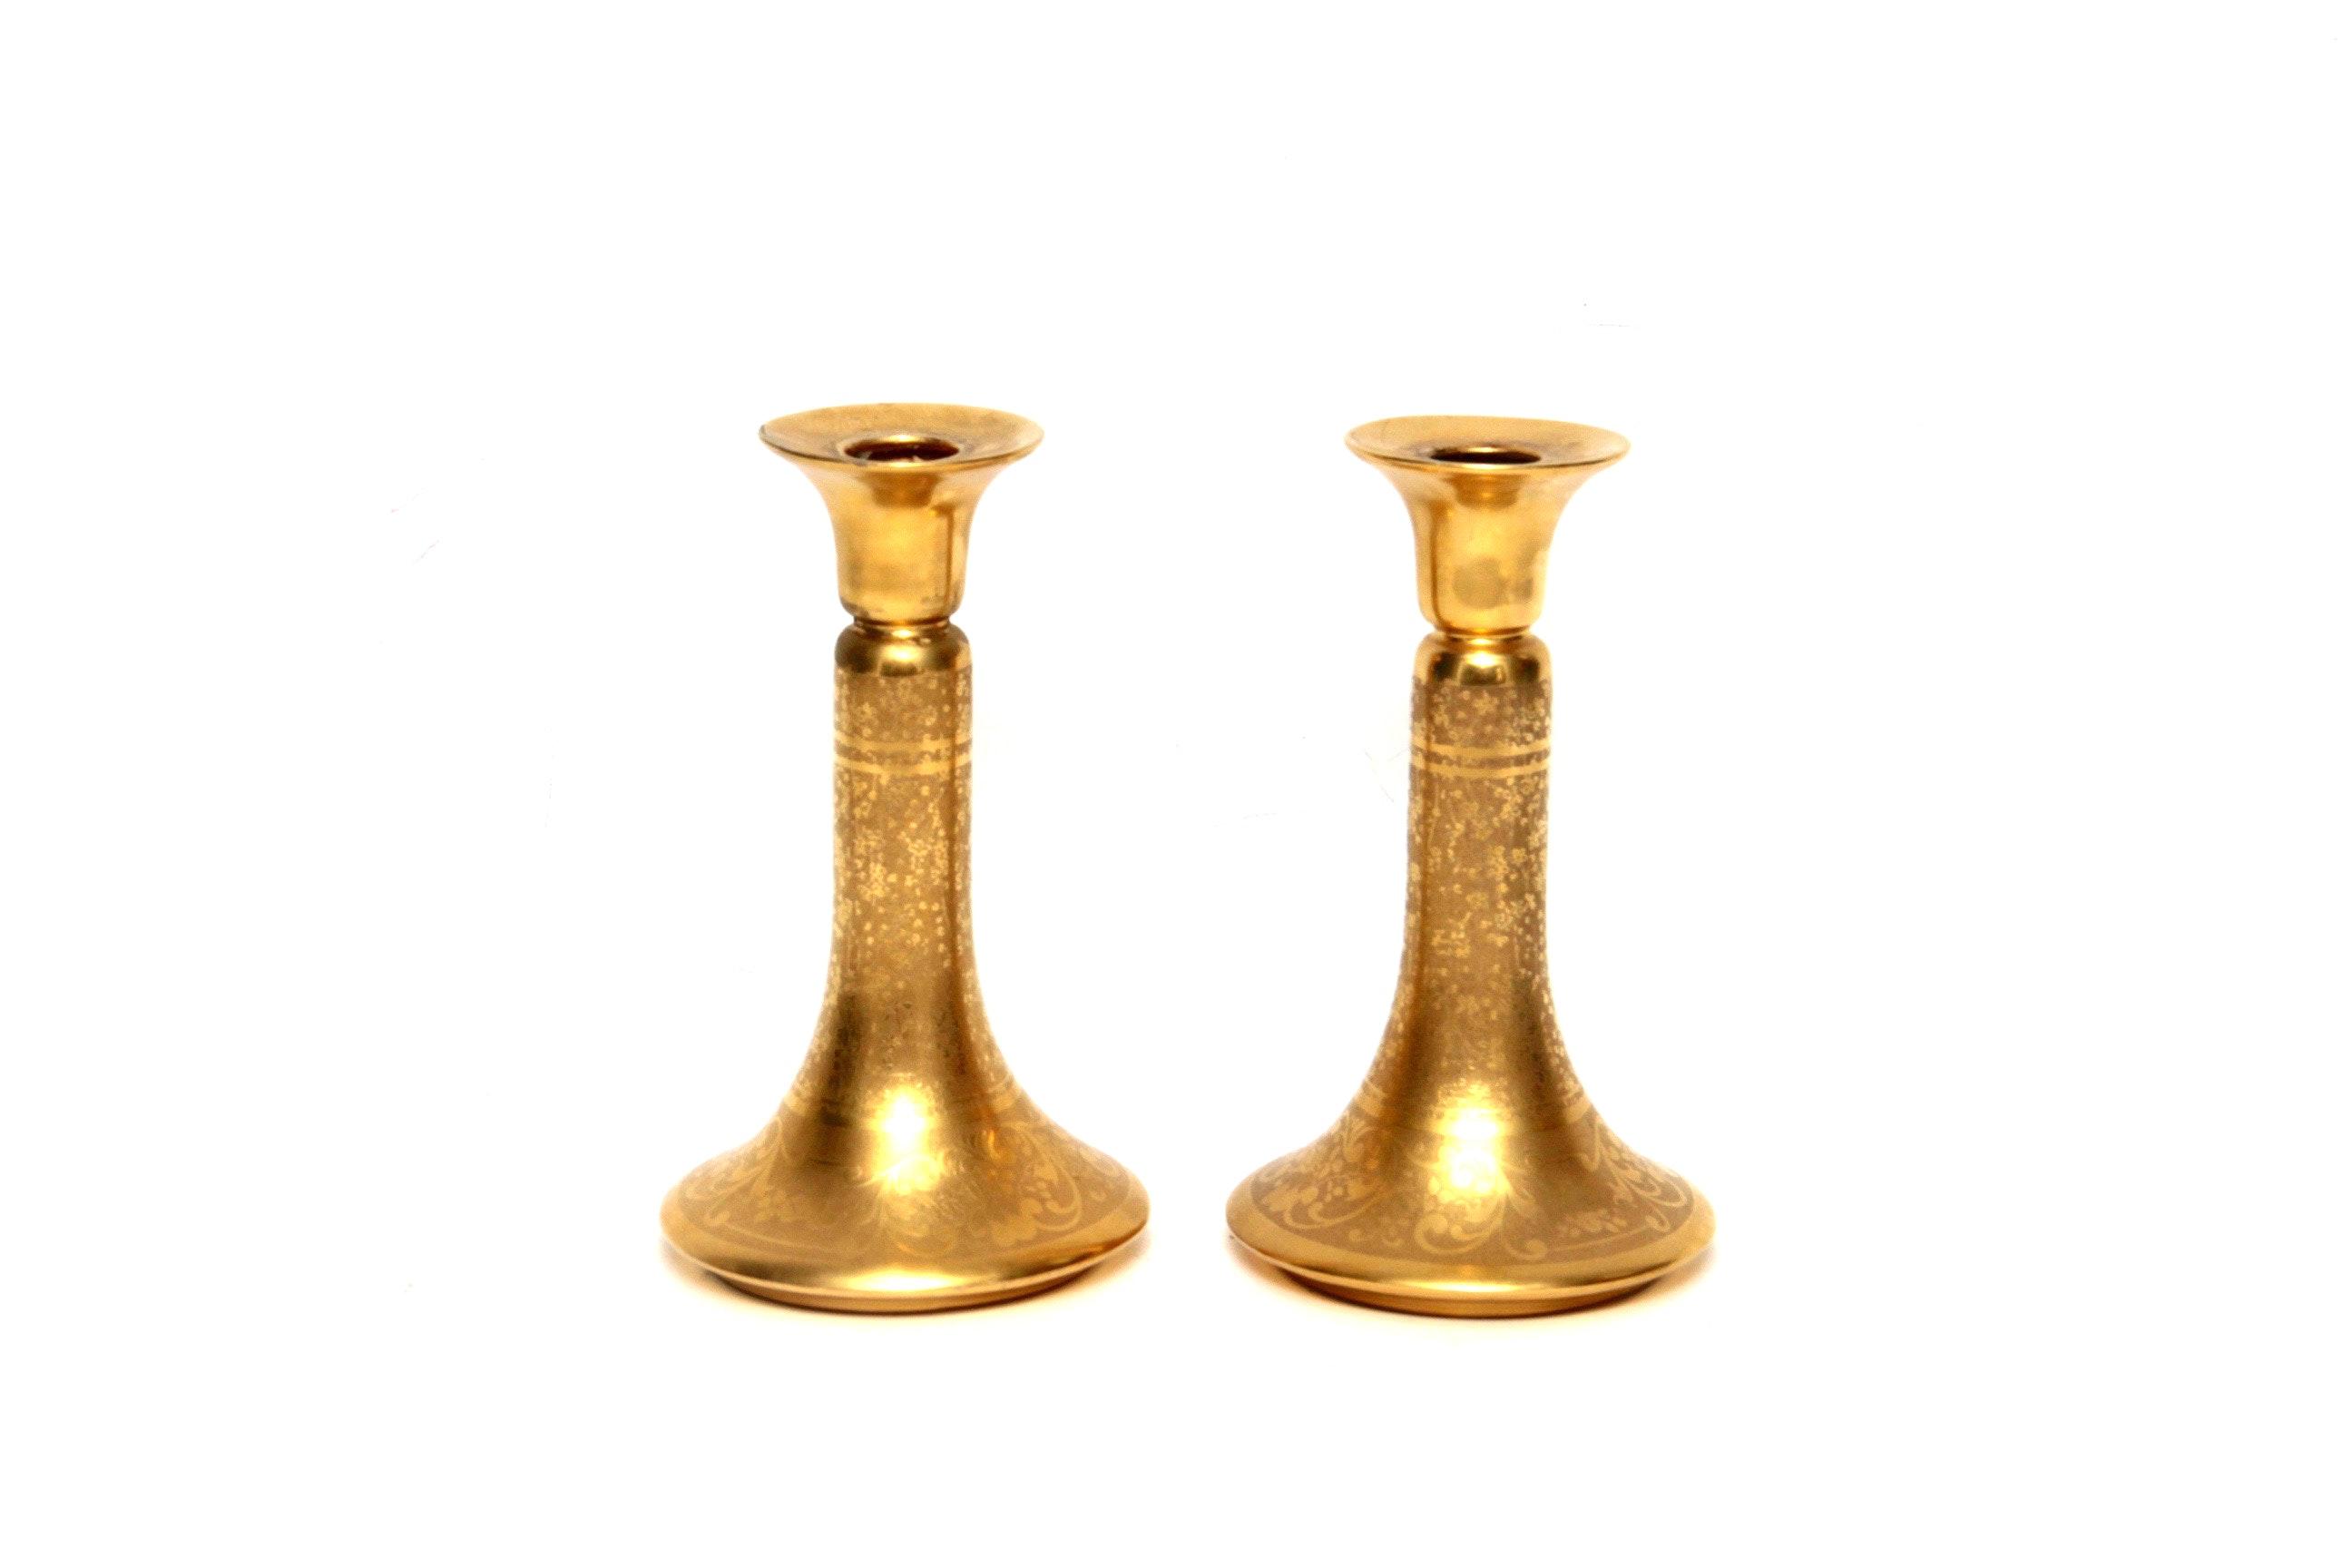 Pair of Gold Encrusted Candlesticks by Osborne Art Studio